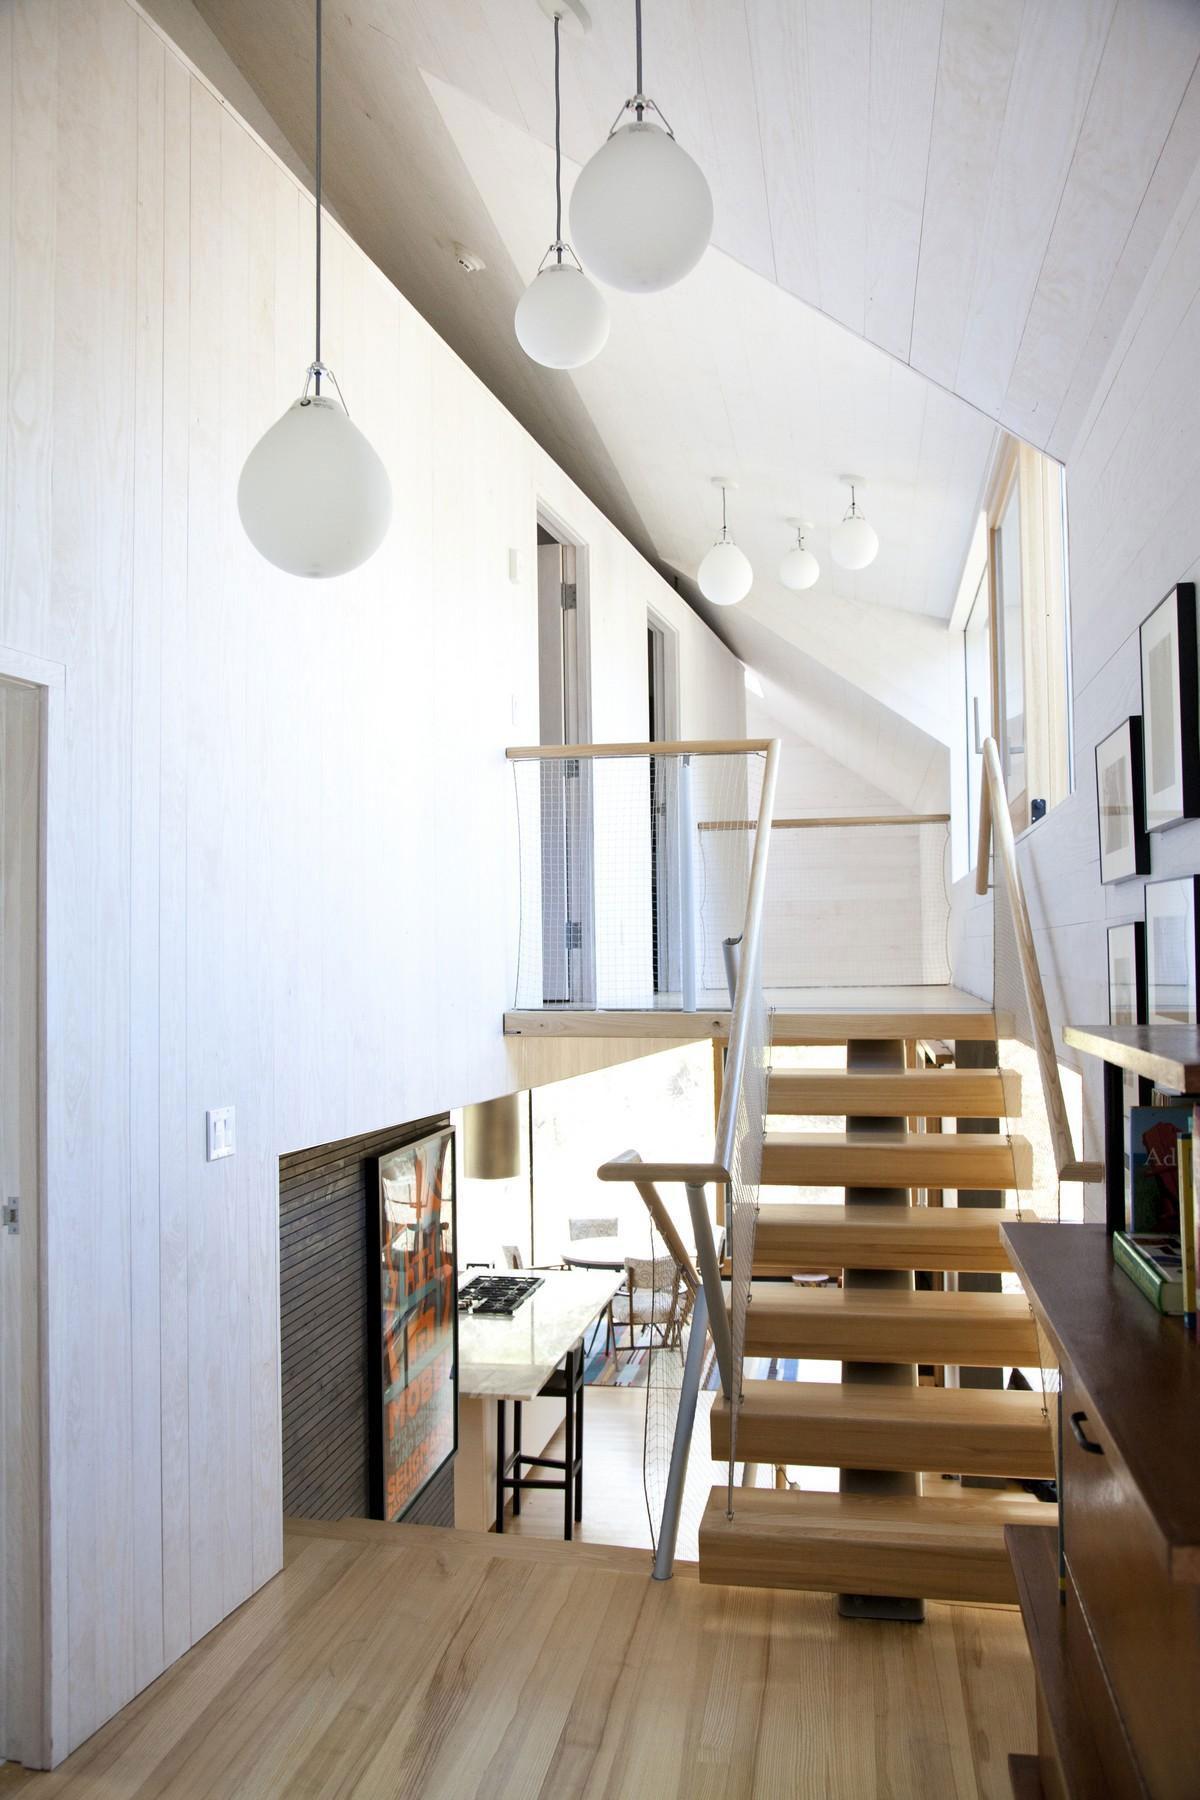 Stairs, Lighting, Rural Retreat in Bantam, Connecticut